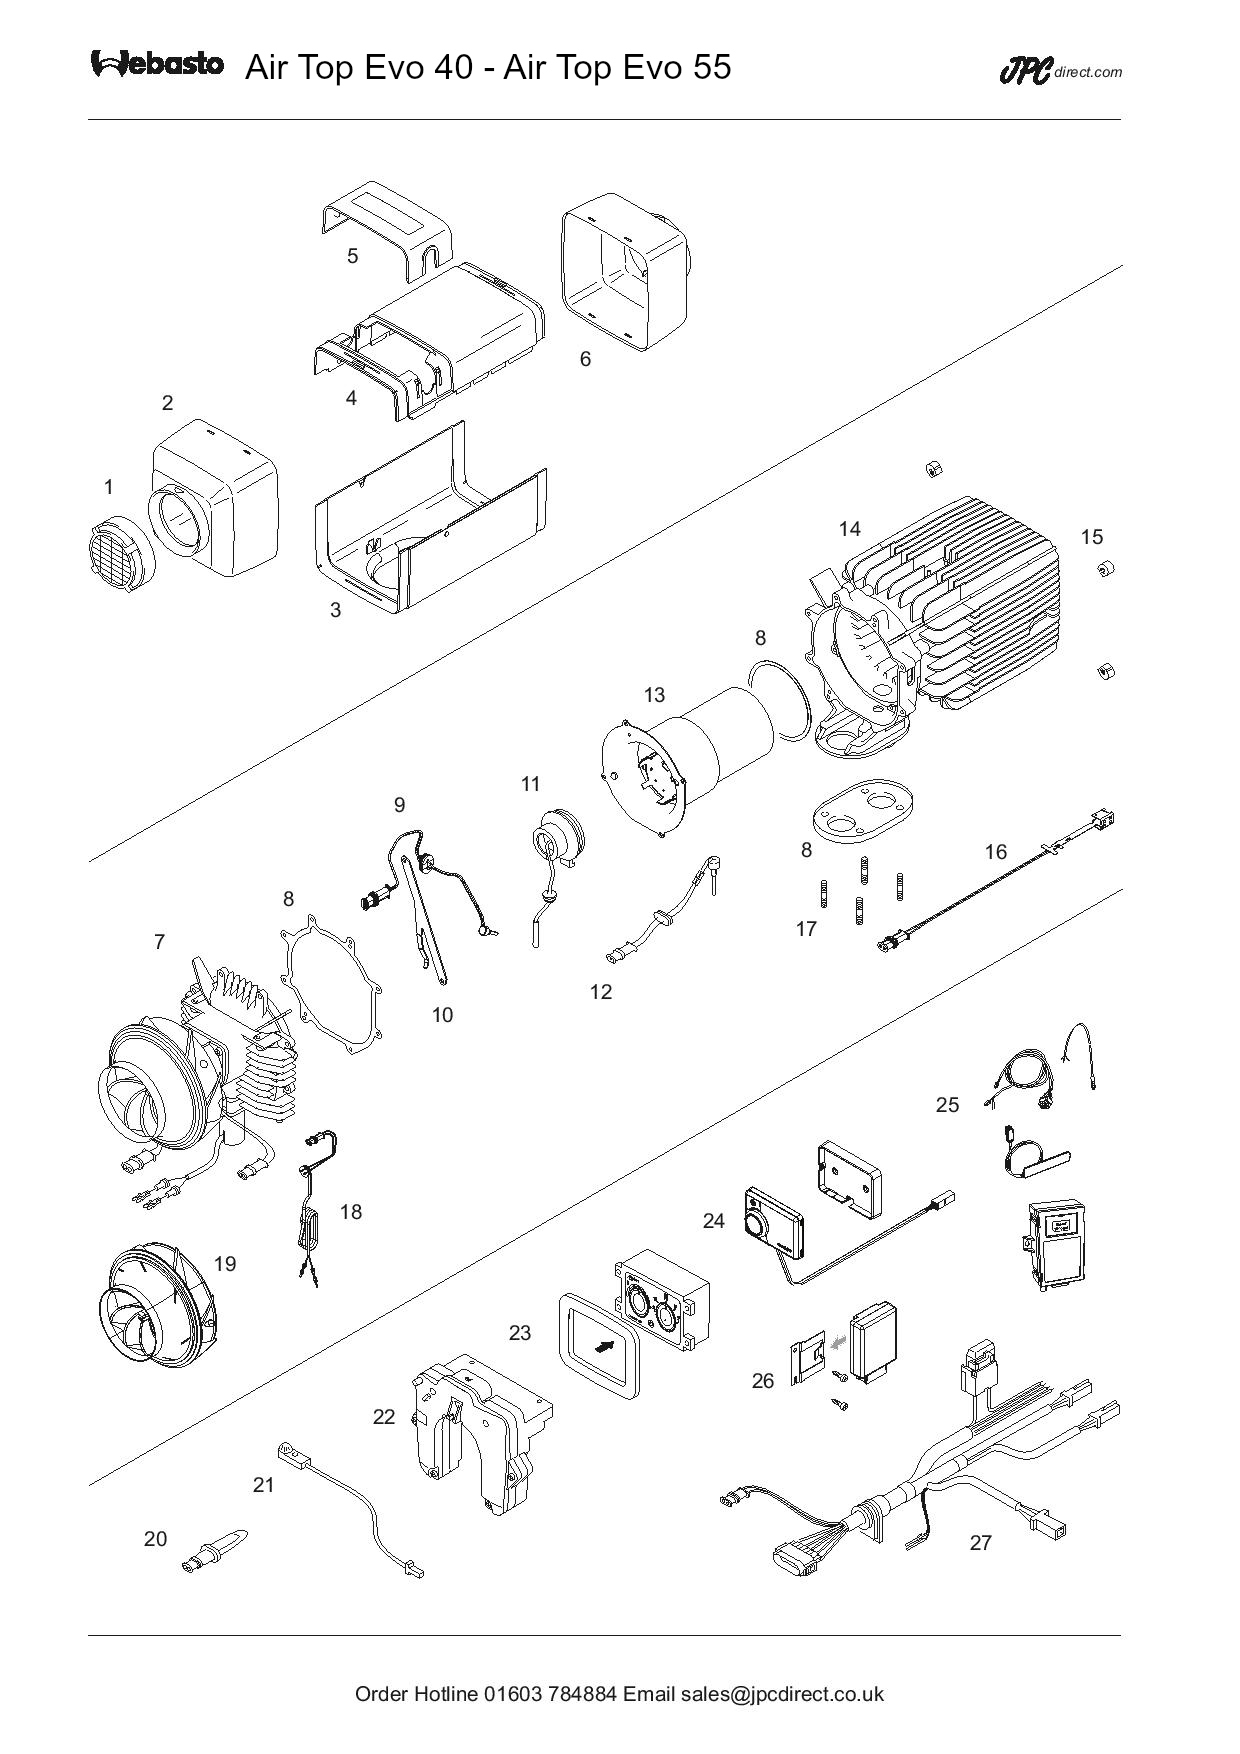 Air Top Evo 40-55 Spare Parts Diagram